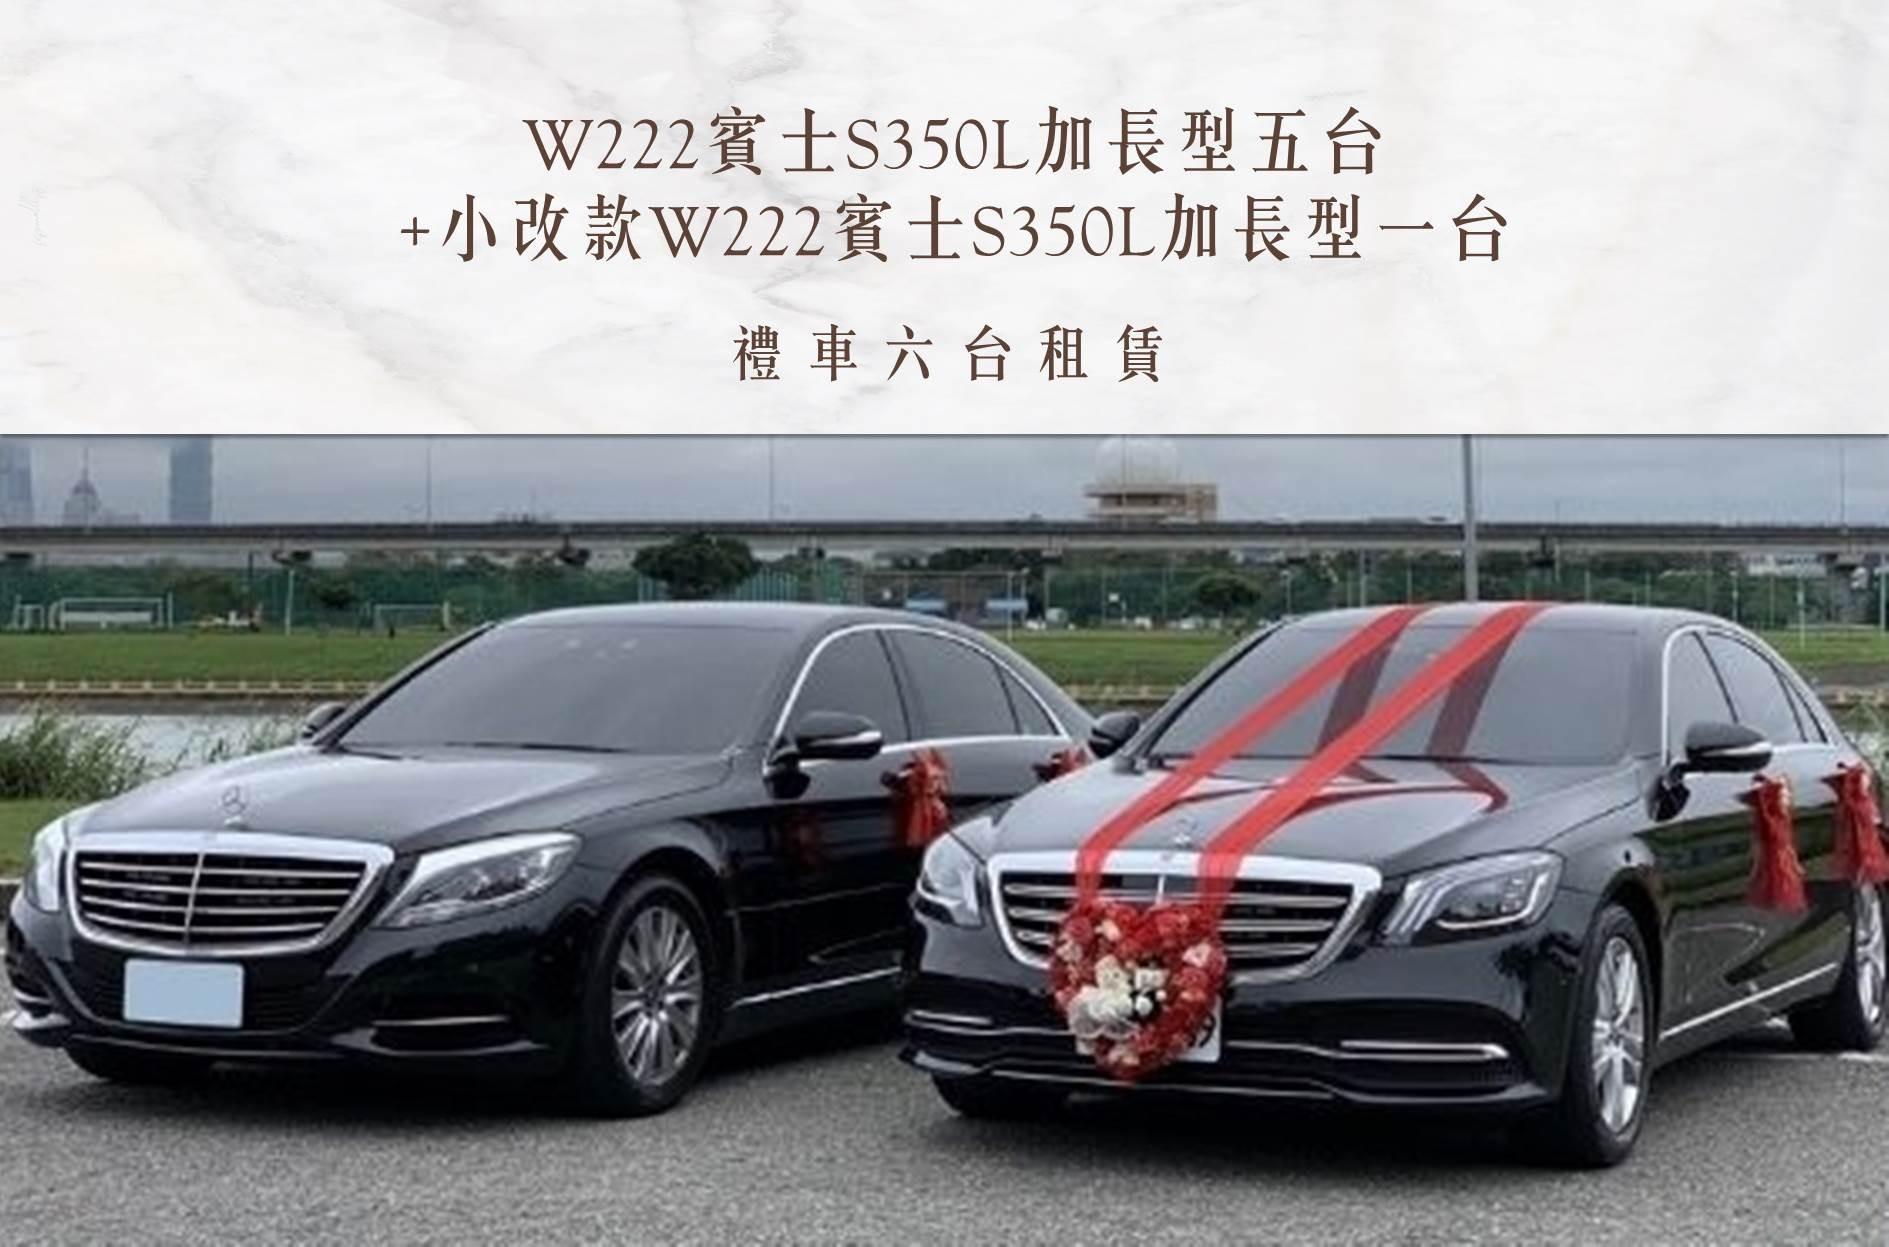 W222賓士S350L加長型五台+小改款W222賓士S350L加長型一台